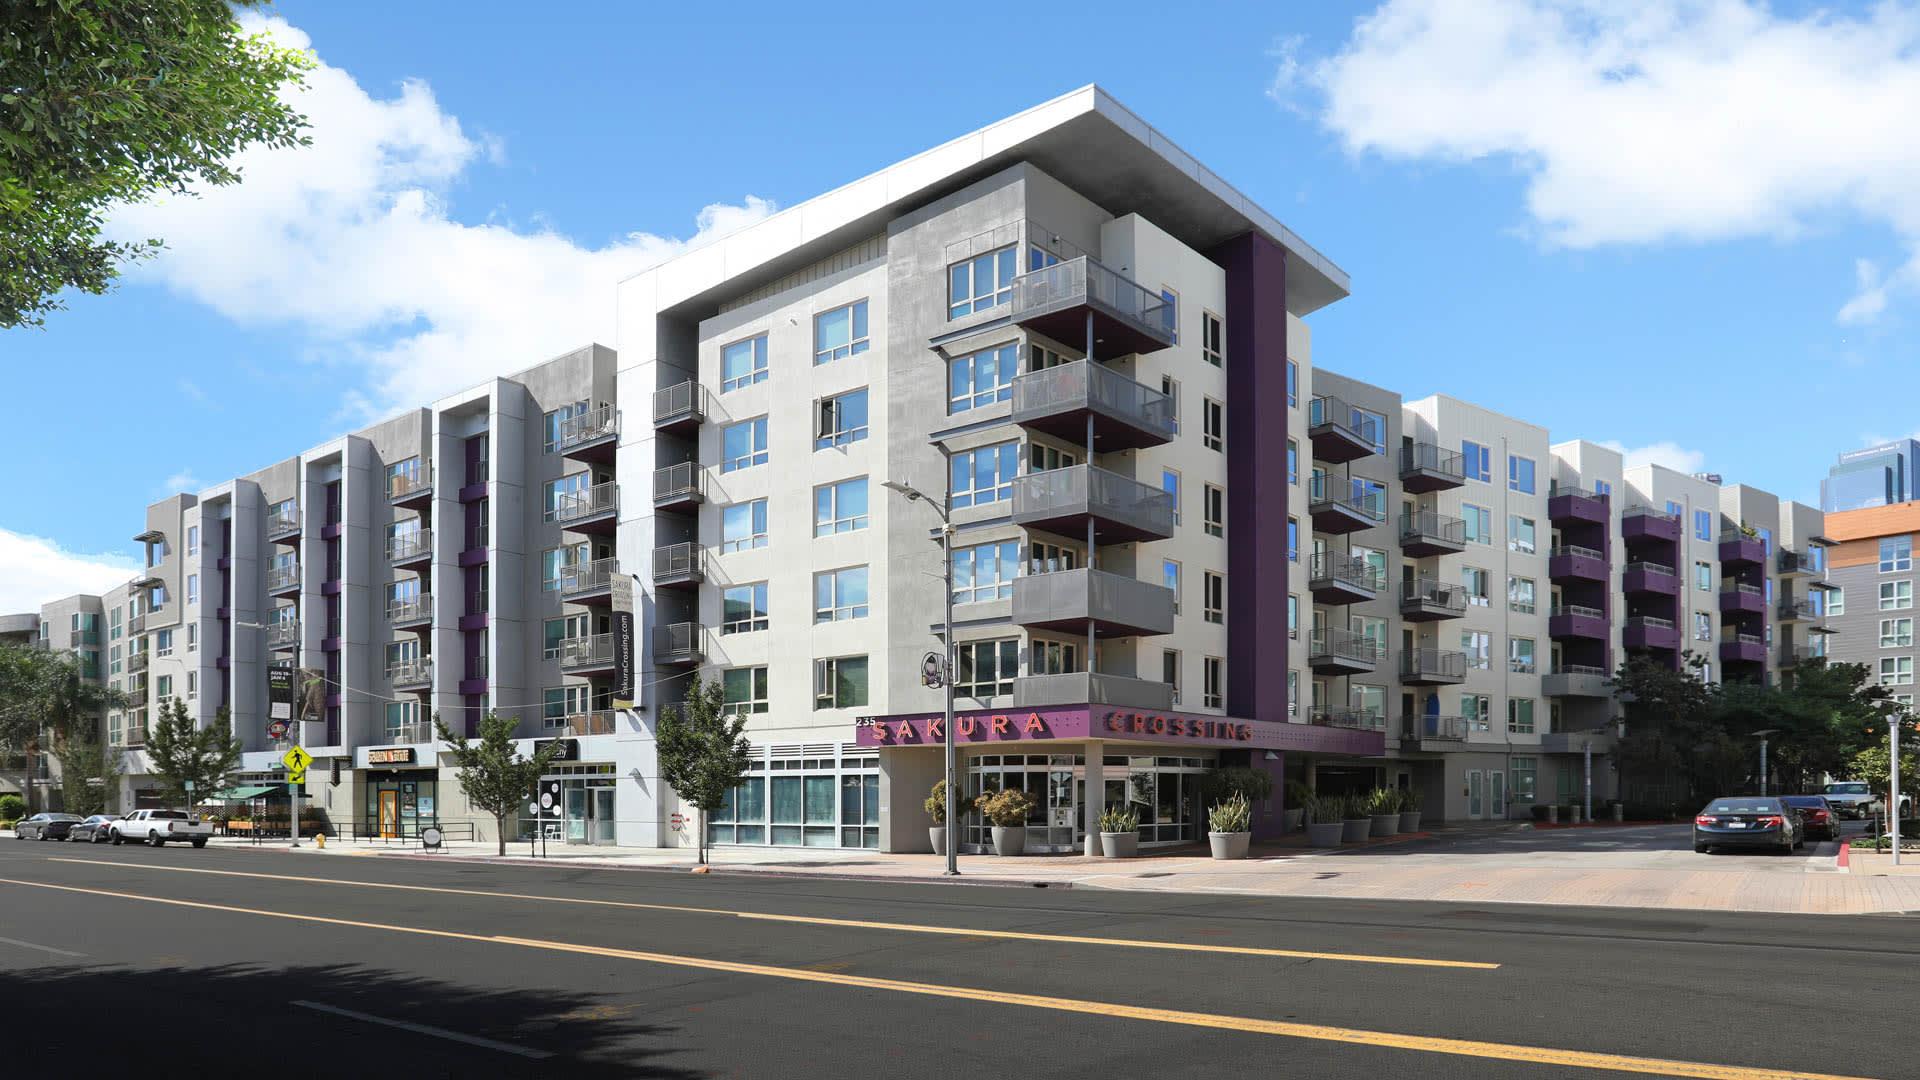 Sakura Crossing Apartments - Exterior